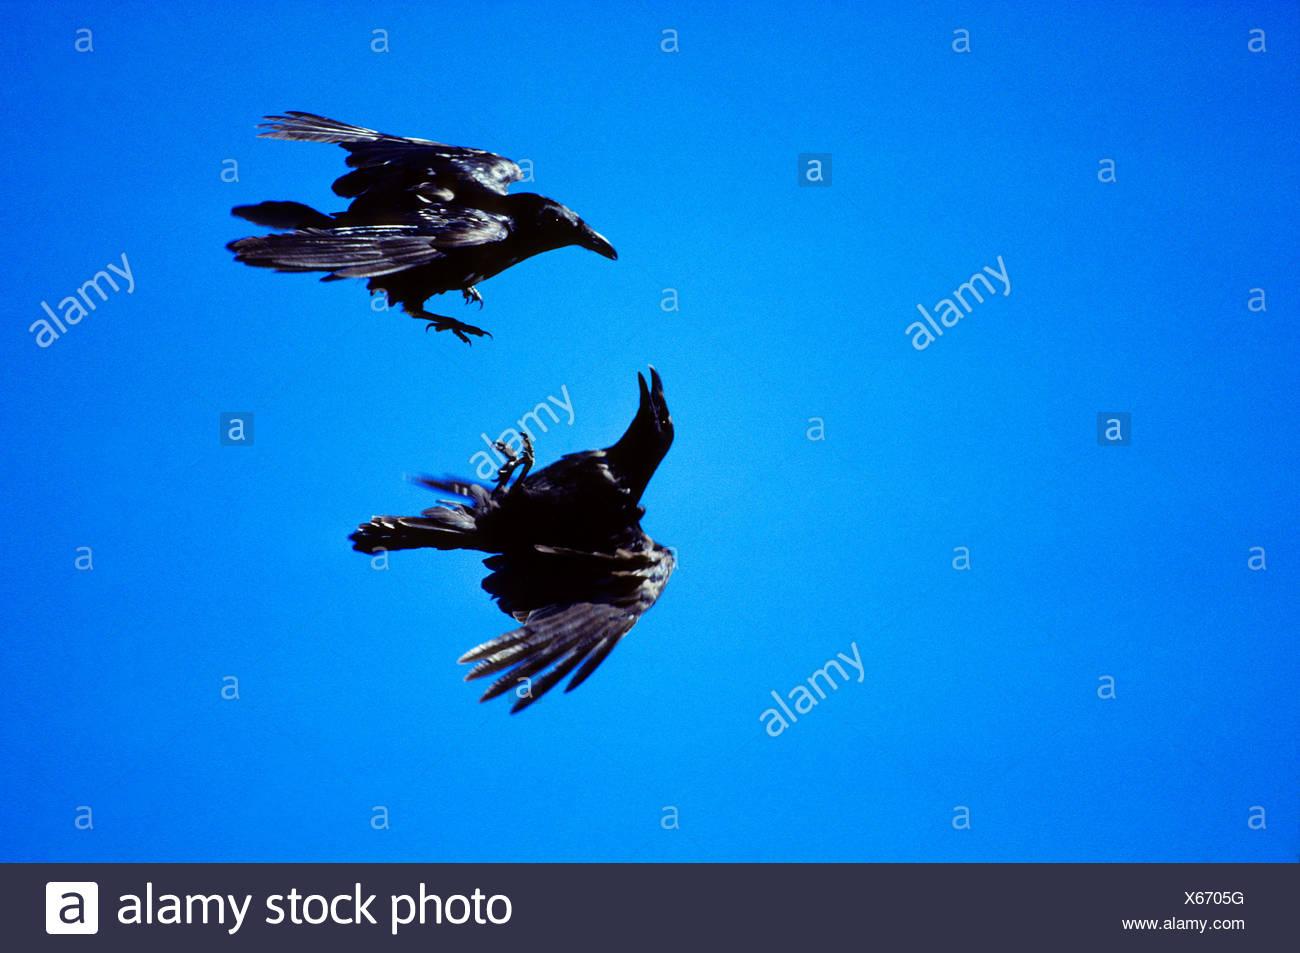 Aerial Courtship in common ravens (Corvus corax).  Alberta, Canada. - Stock Image